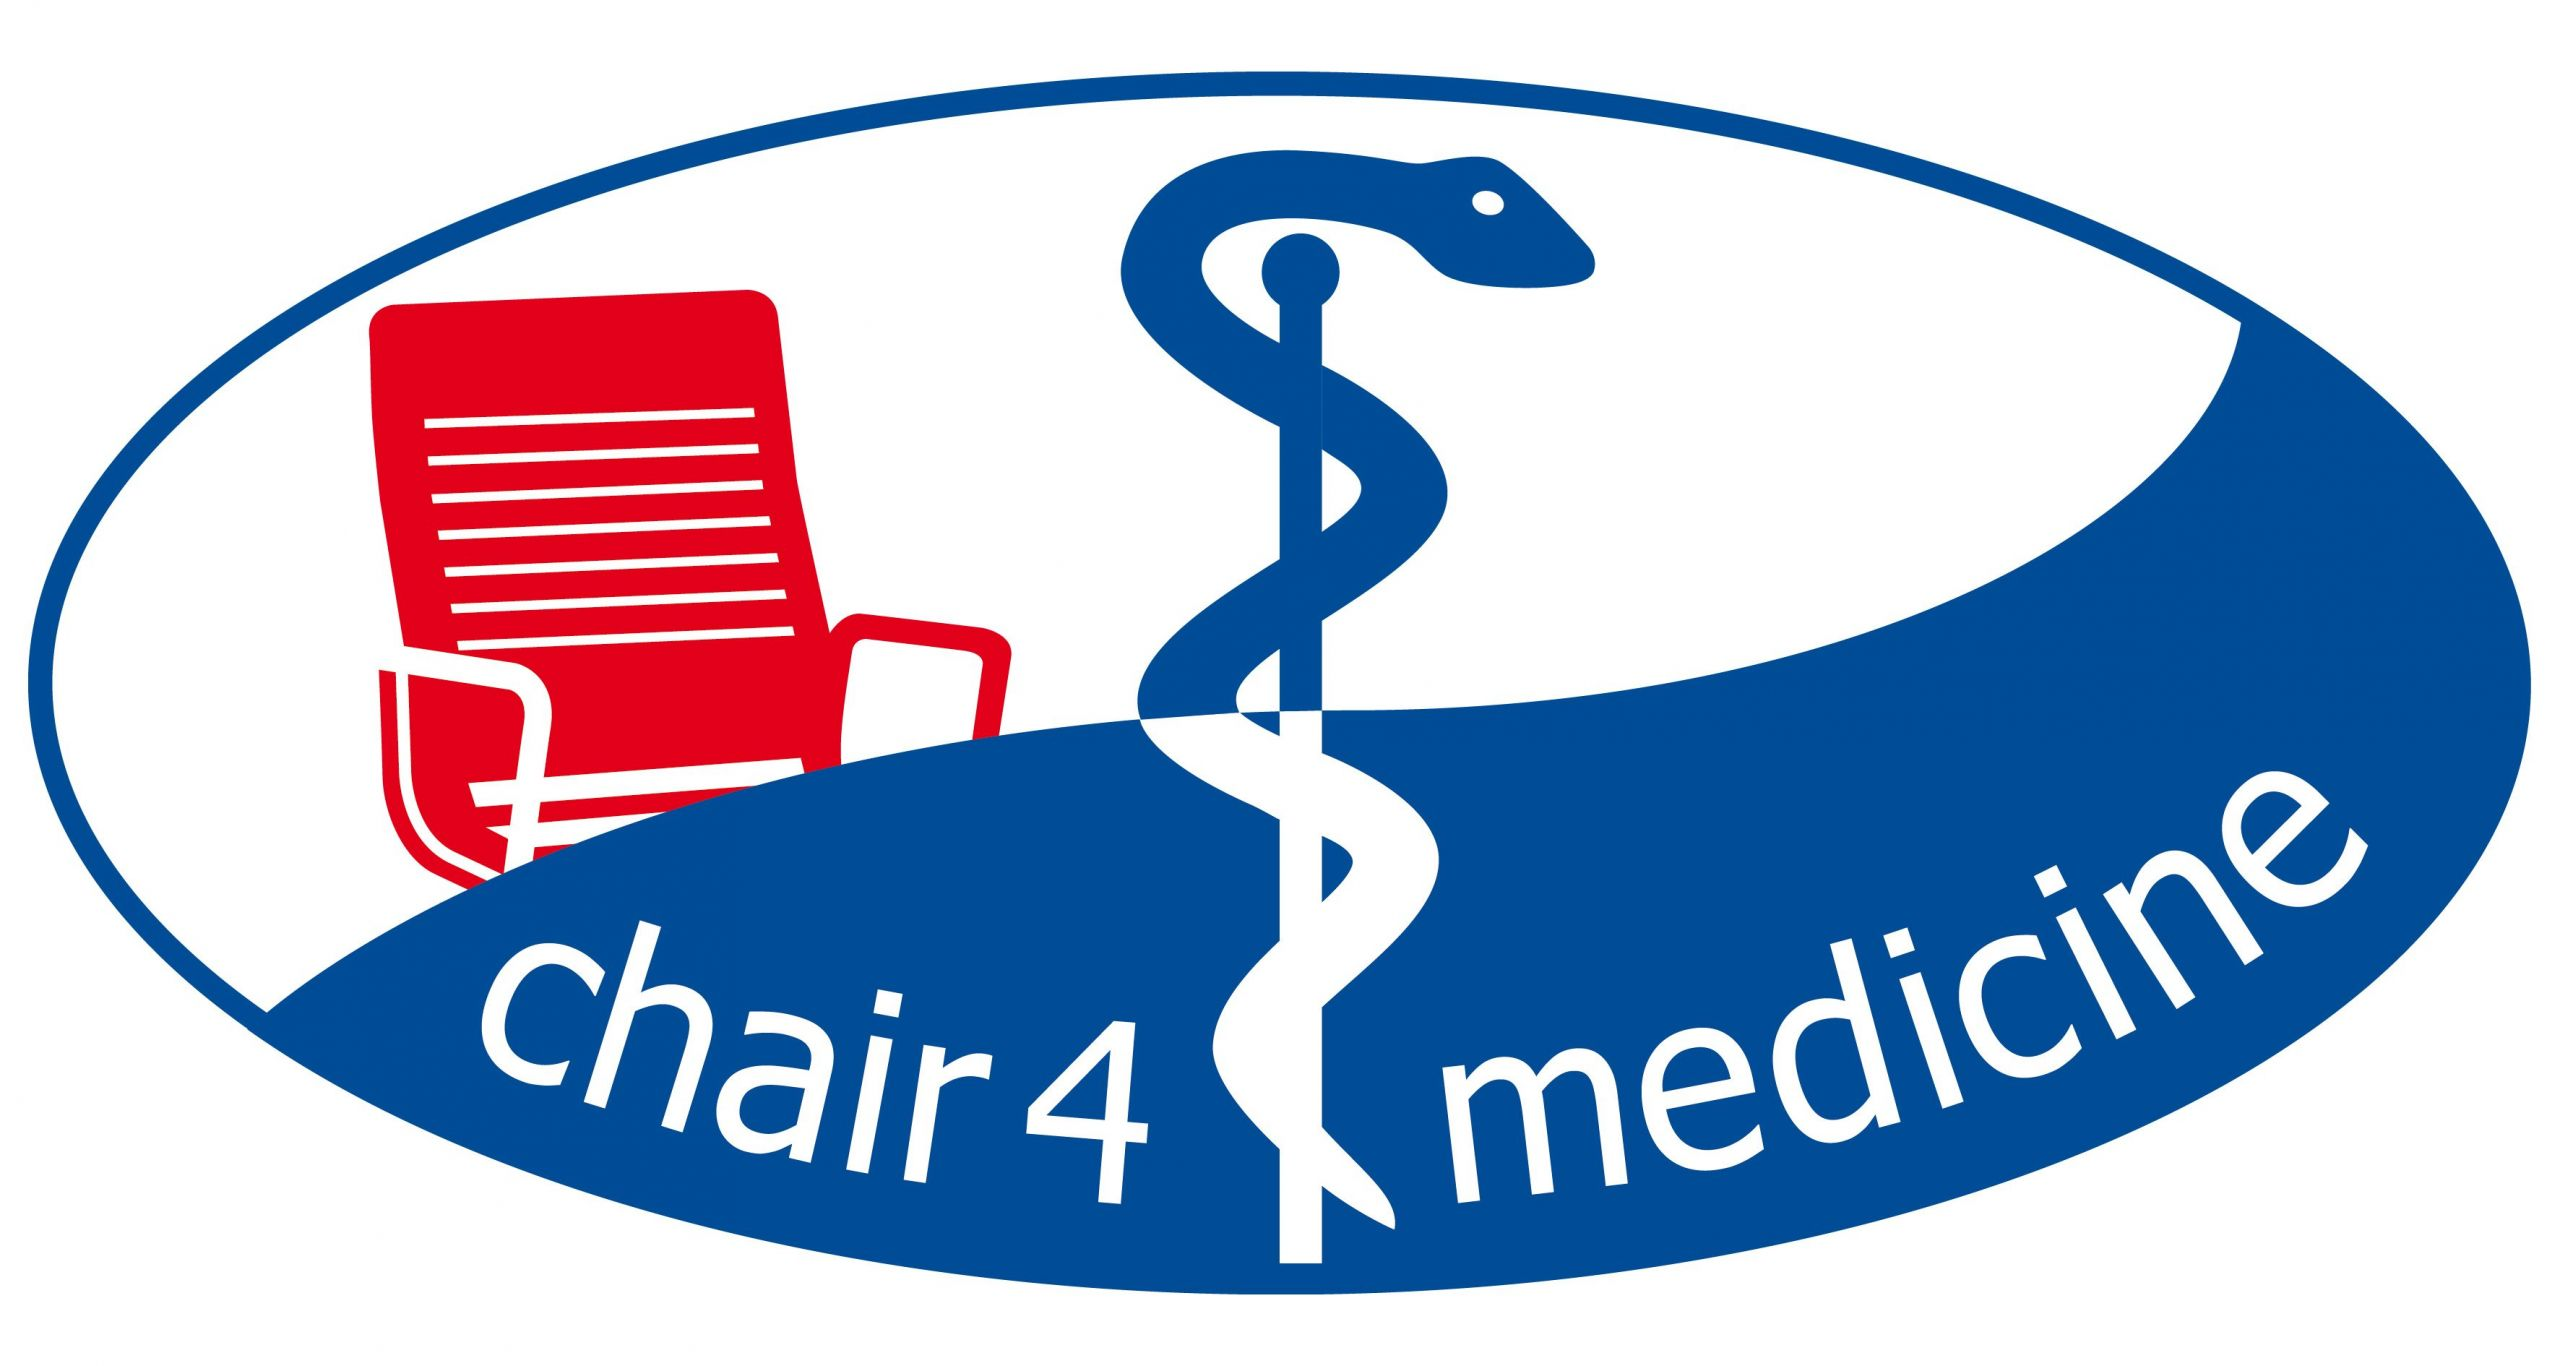 Chair for Medicine Logo